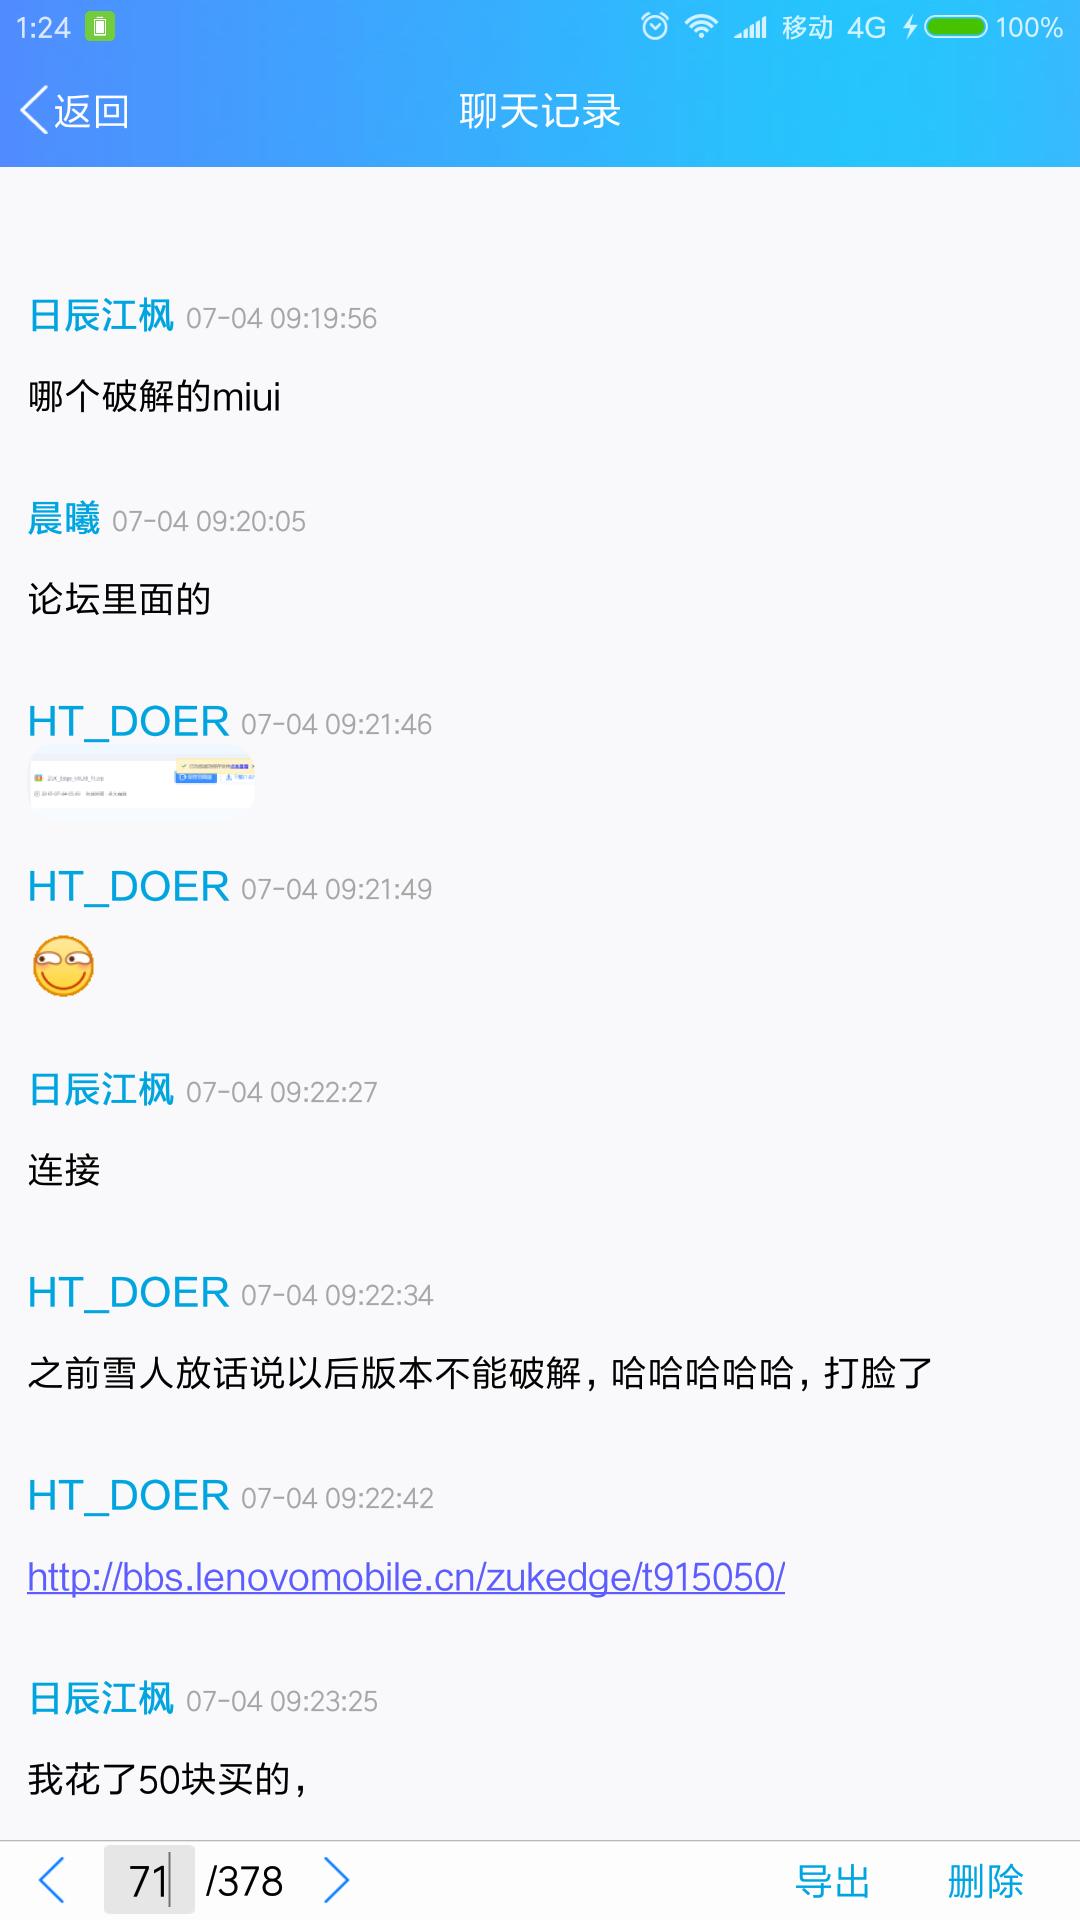 Screenshot_2017-07-09-01-24-31-251_com.tencent.mobileqq.png